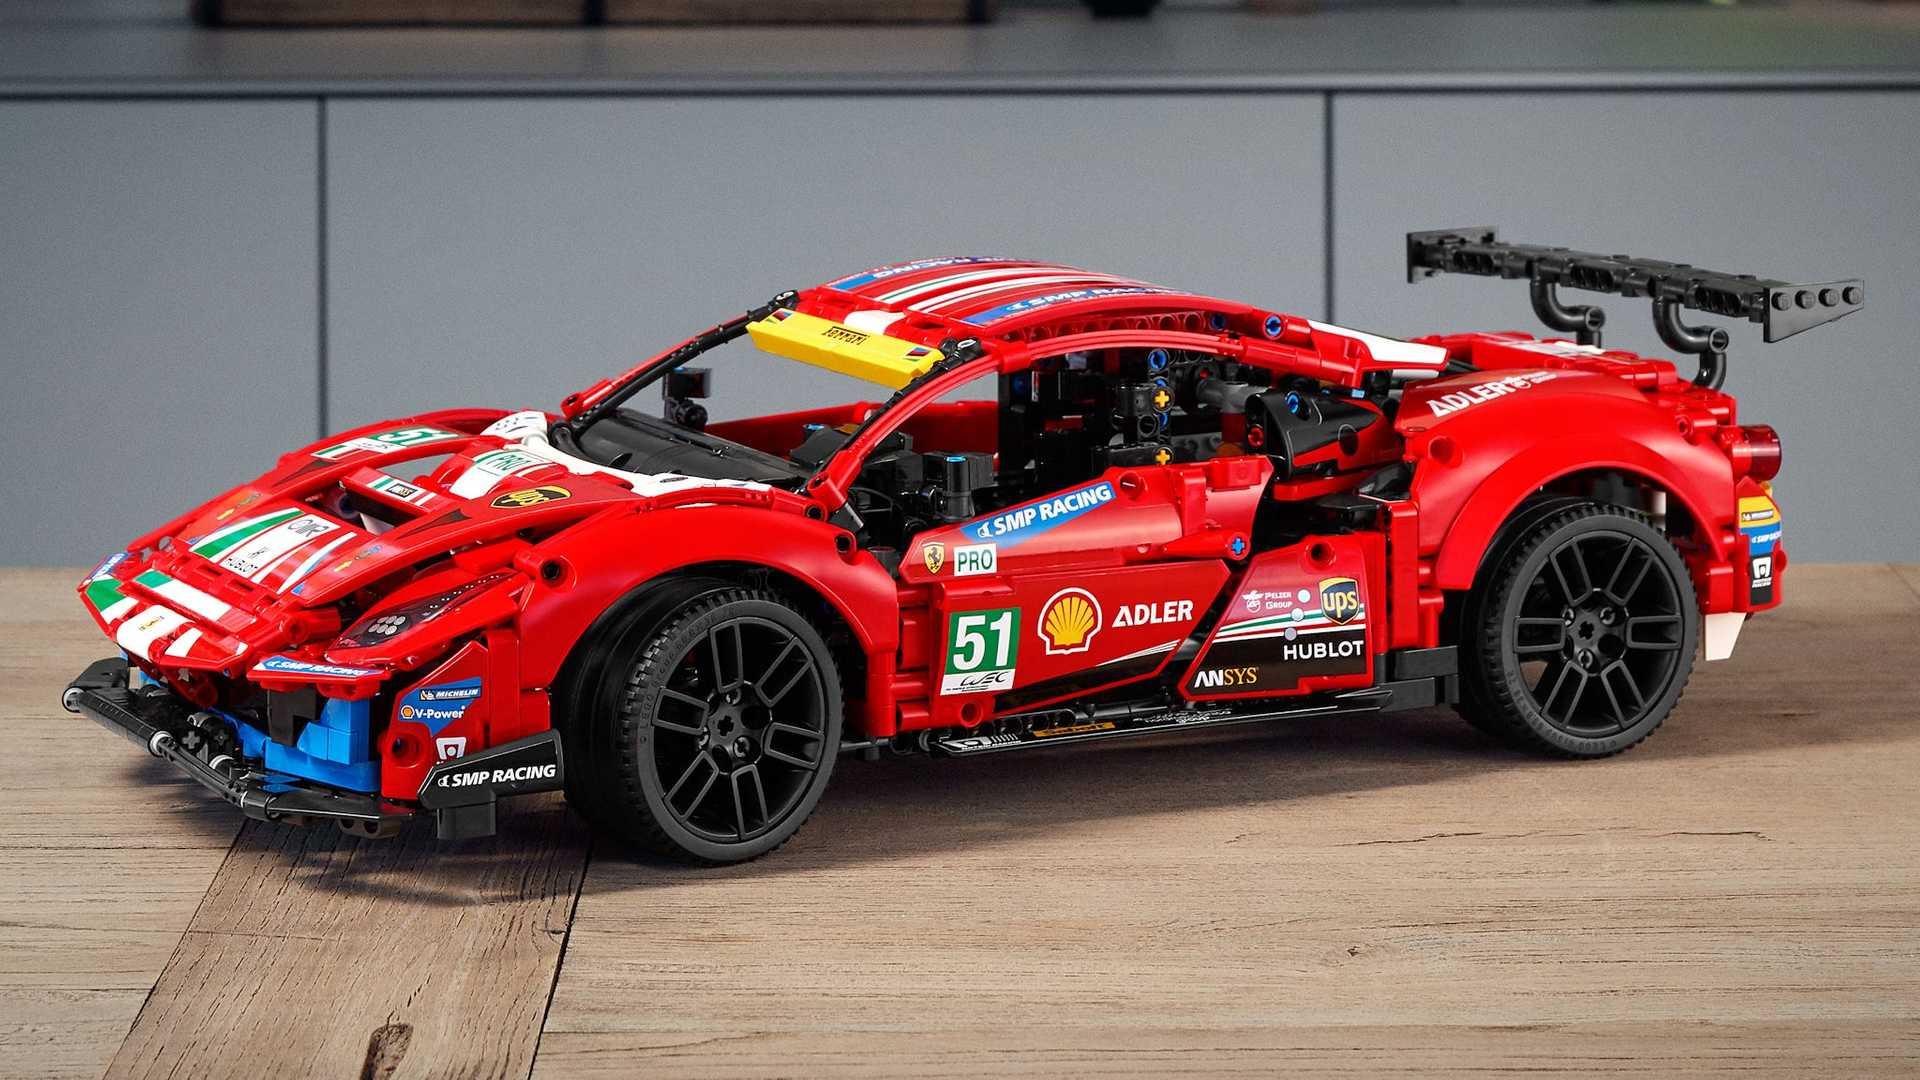 Lego-Technic-Ferrari-488-GTE-AF-Corse-51-2